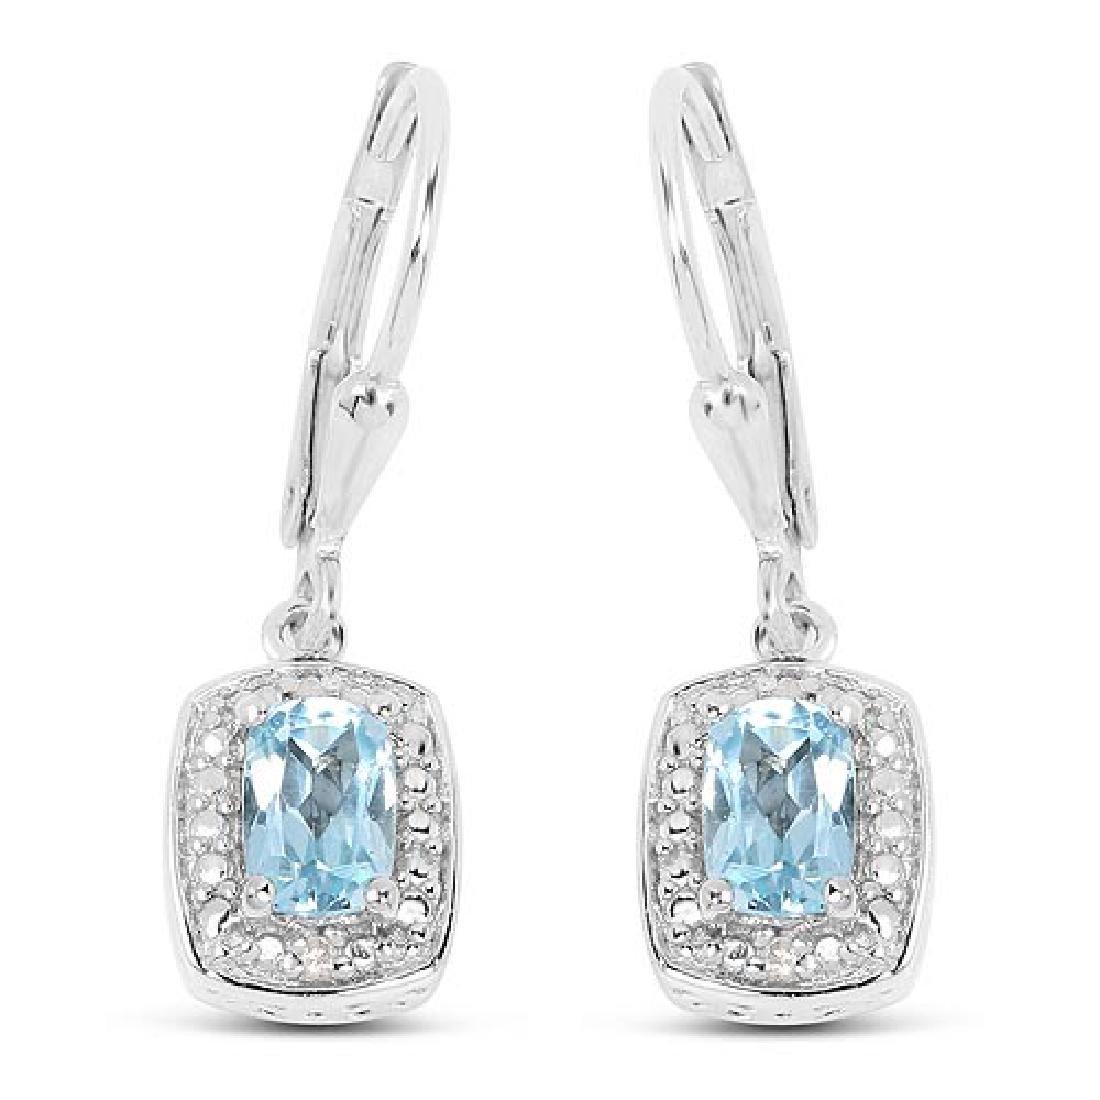 1.23 Carat Genuine Blue Topaz and White Diamond .925 St